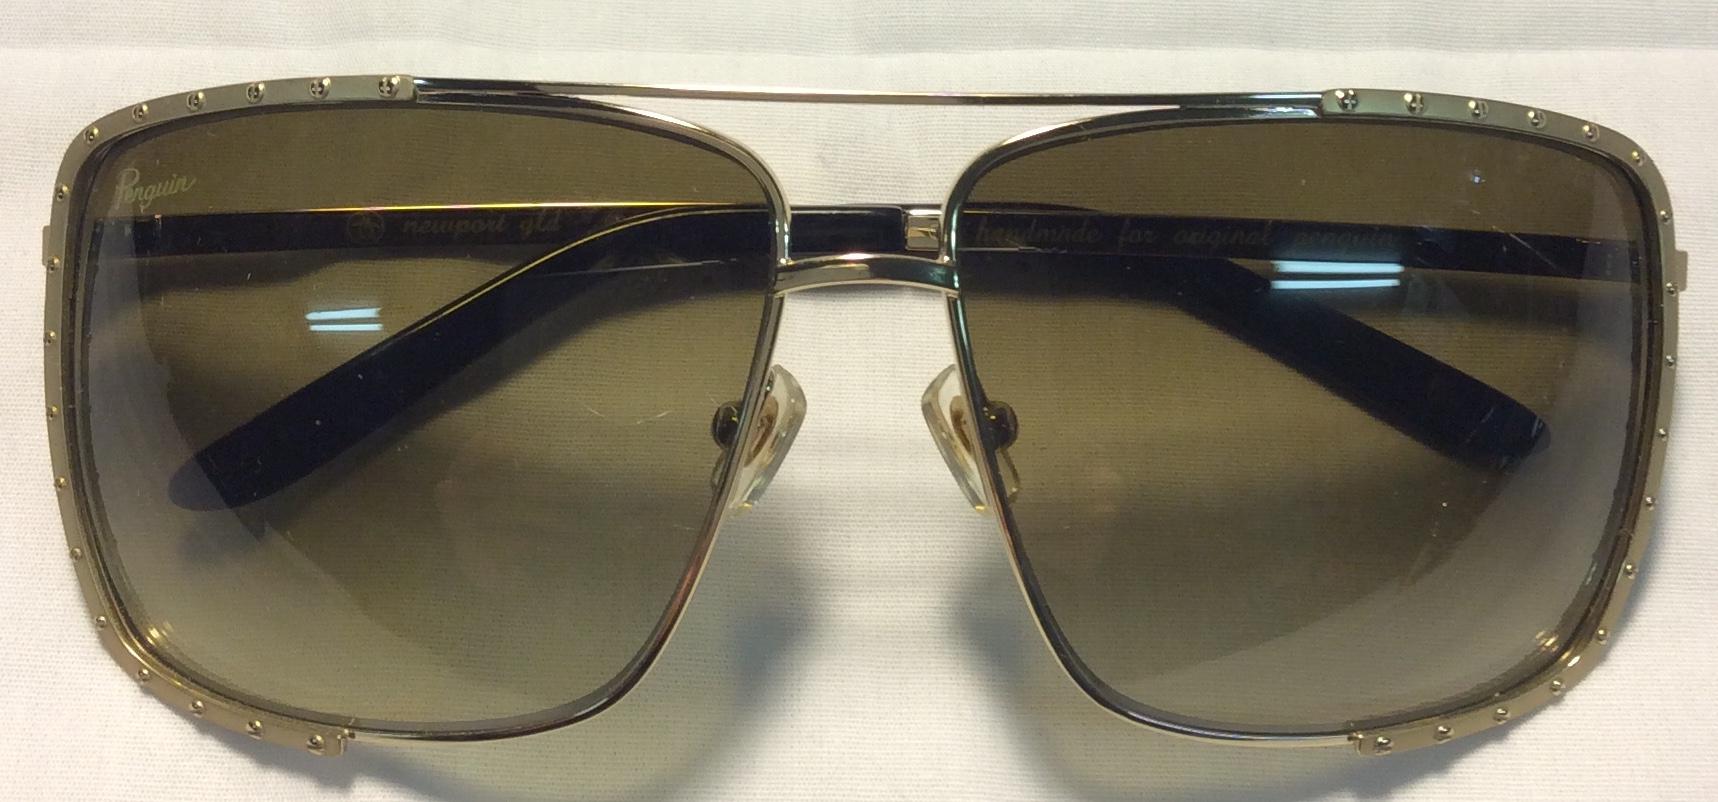 Newport gld - Penguin Gold frames